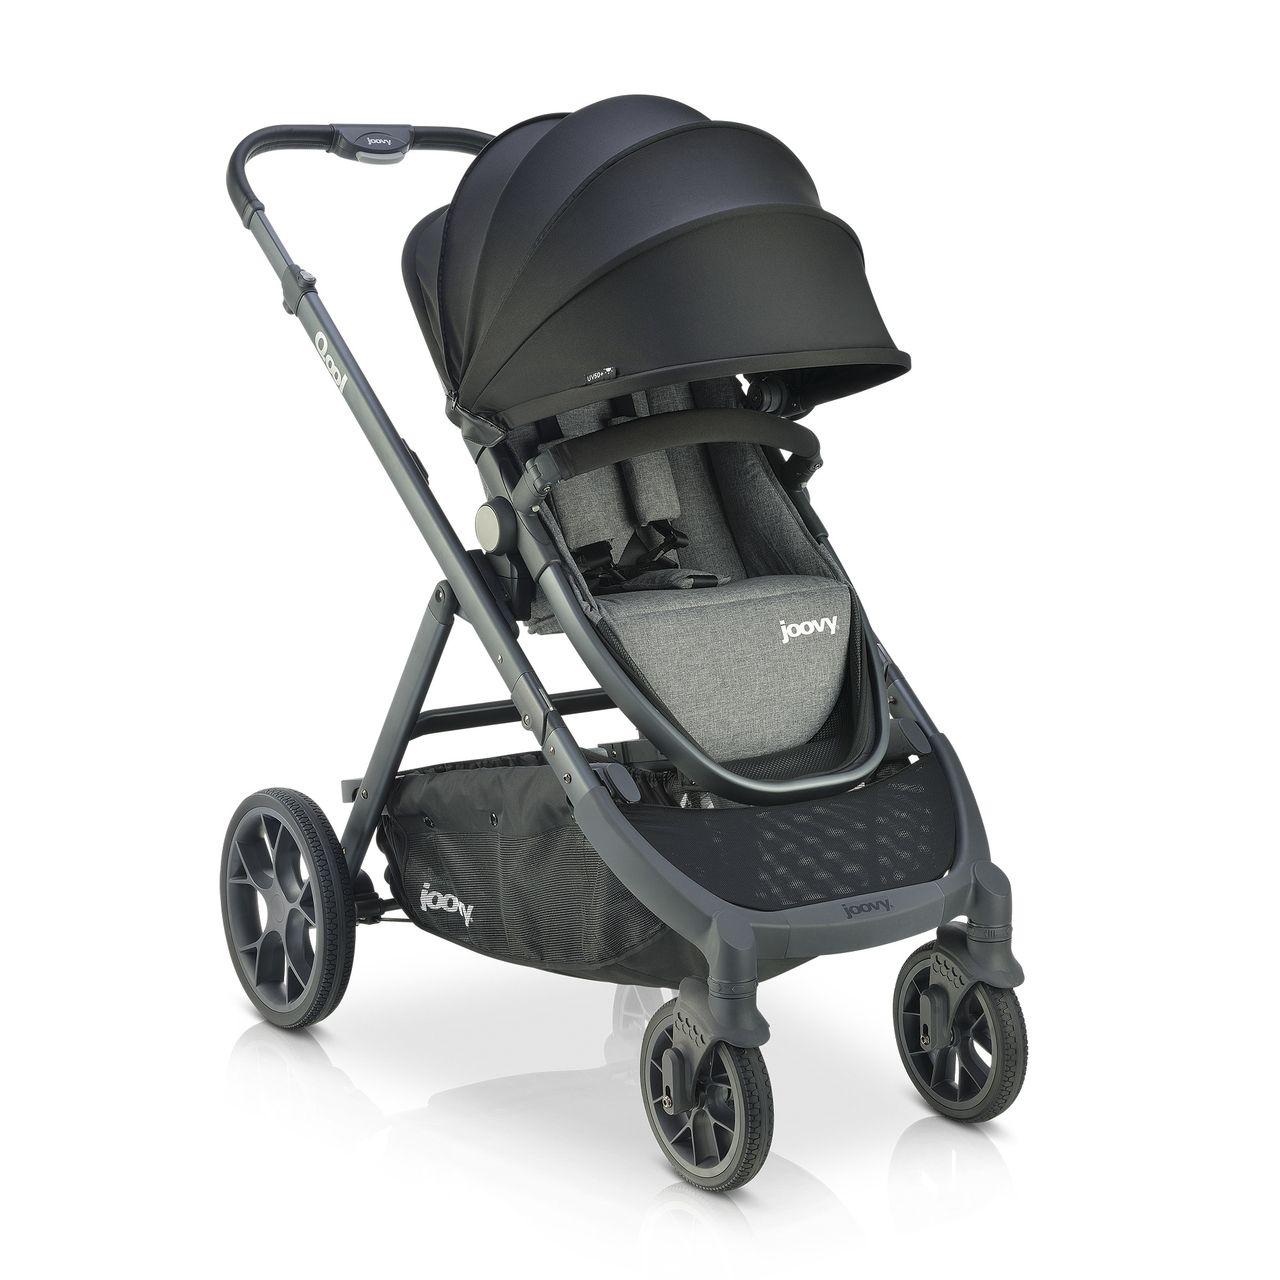 Qool in 2020 Triple stroller, Stroller, Joovy stroller